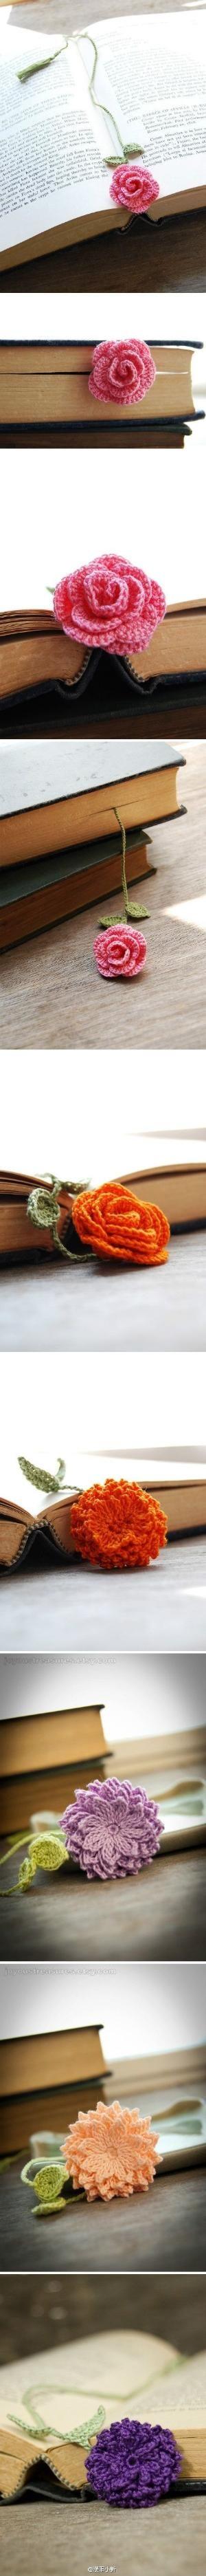 pretty bookmarks - crochet flowers by Underwaterpixie